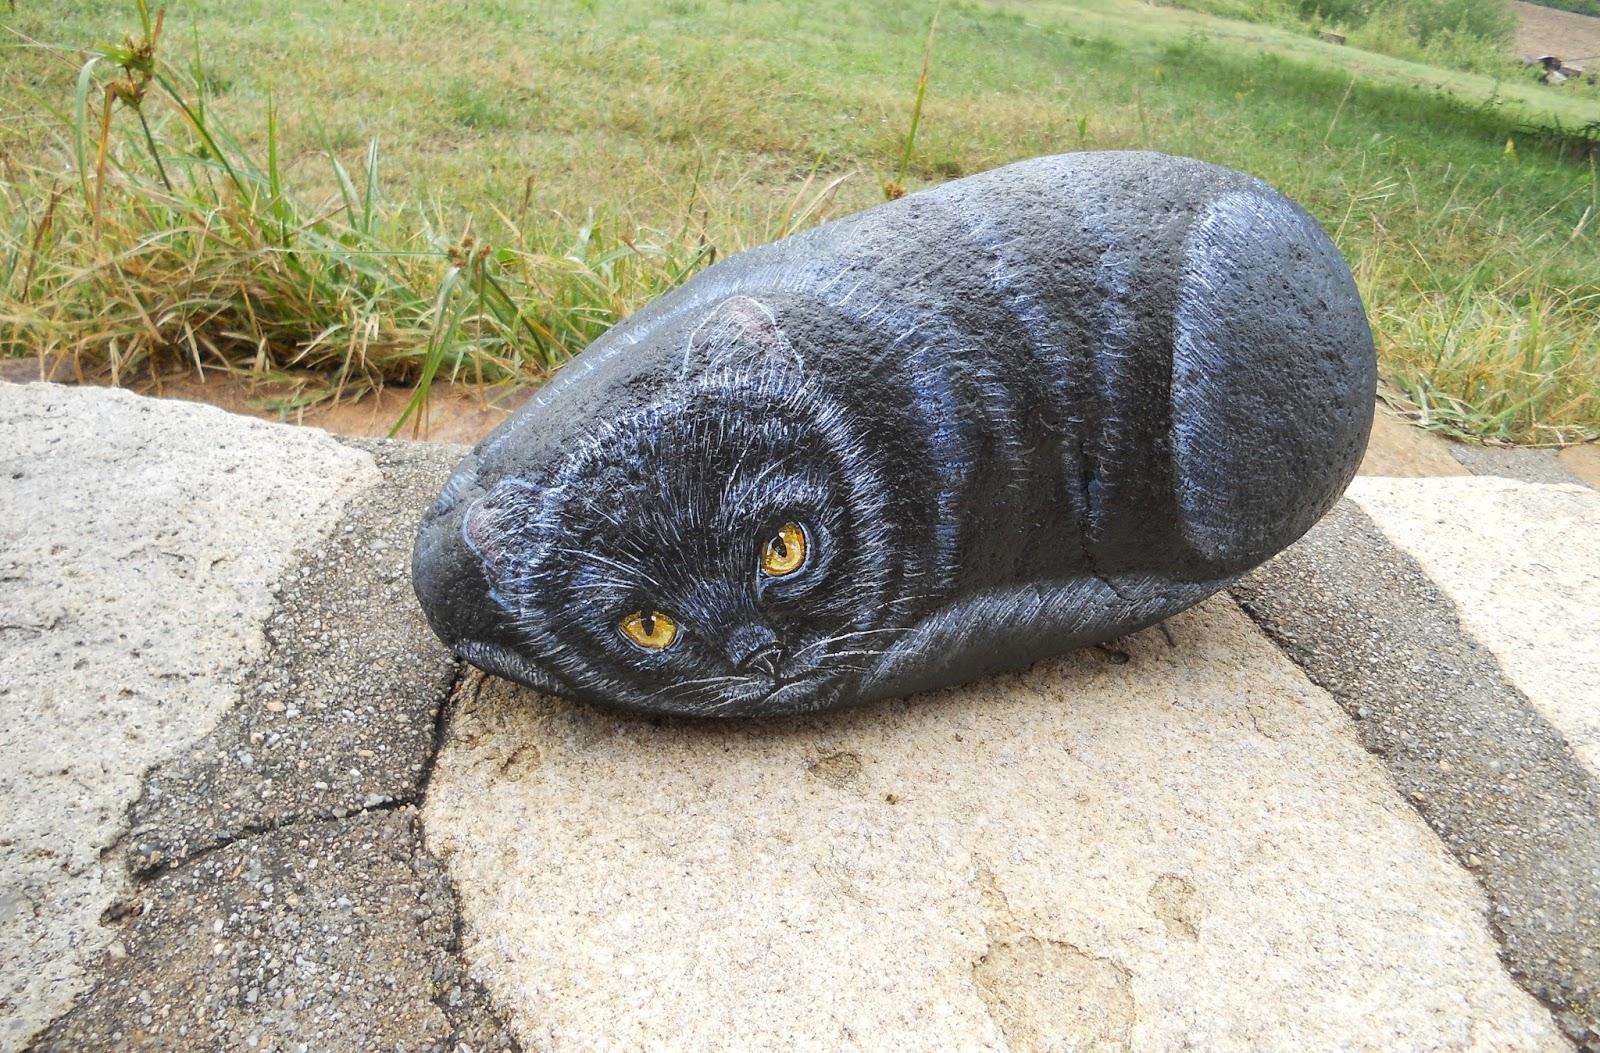 Piedras pintadas a mano tutorial como pintar ojos de gatos for Como pintar imitacion piedra